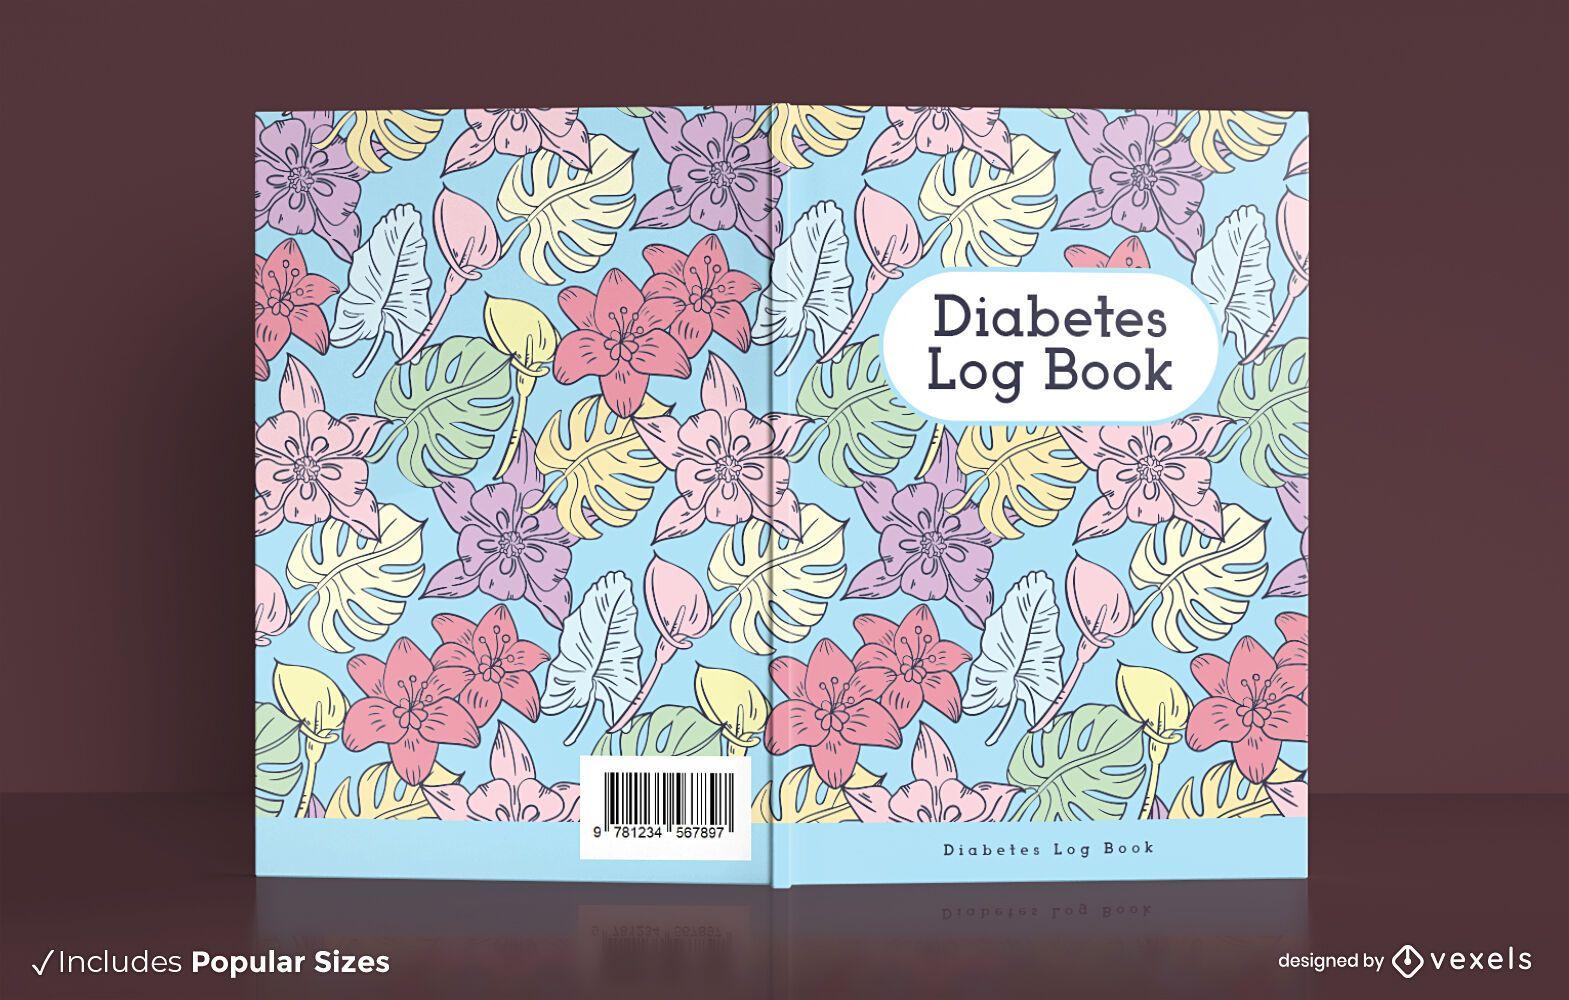 Diabetes log book cover design